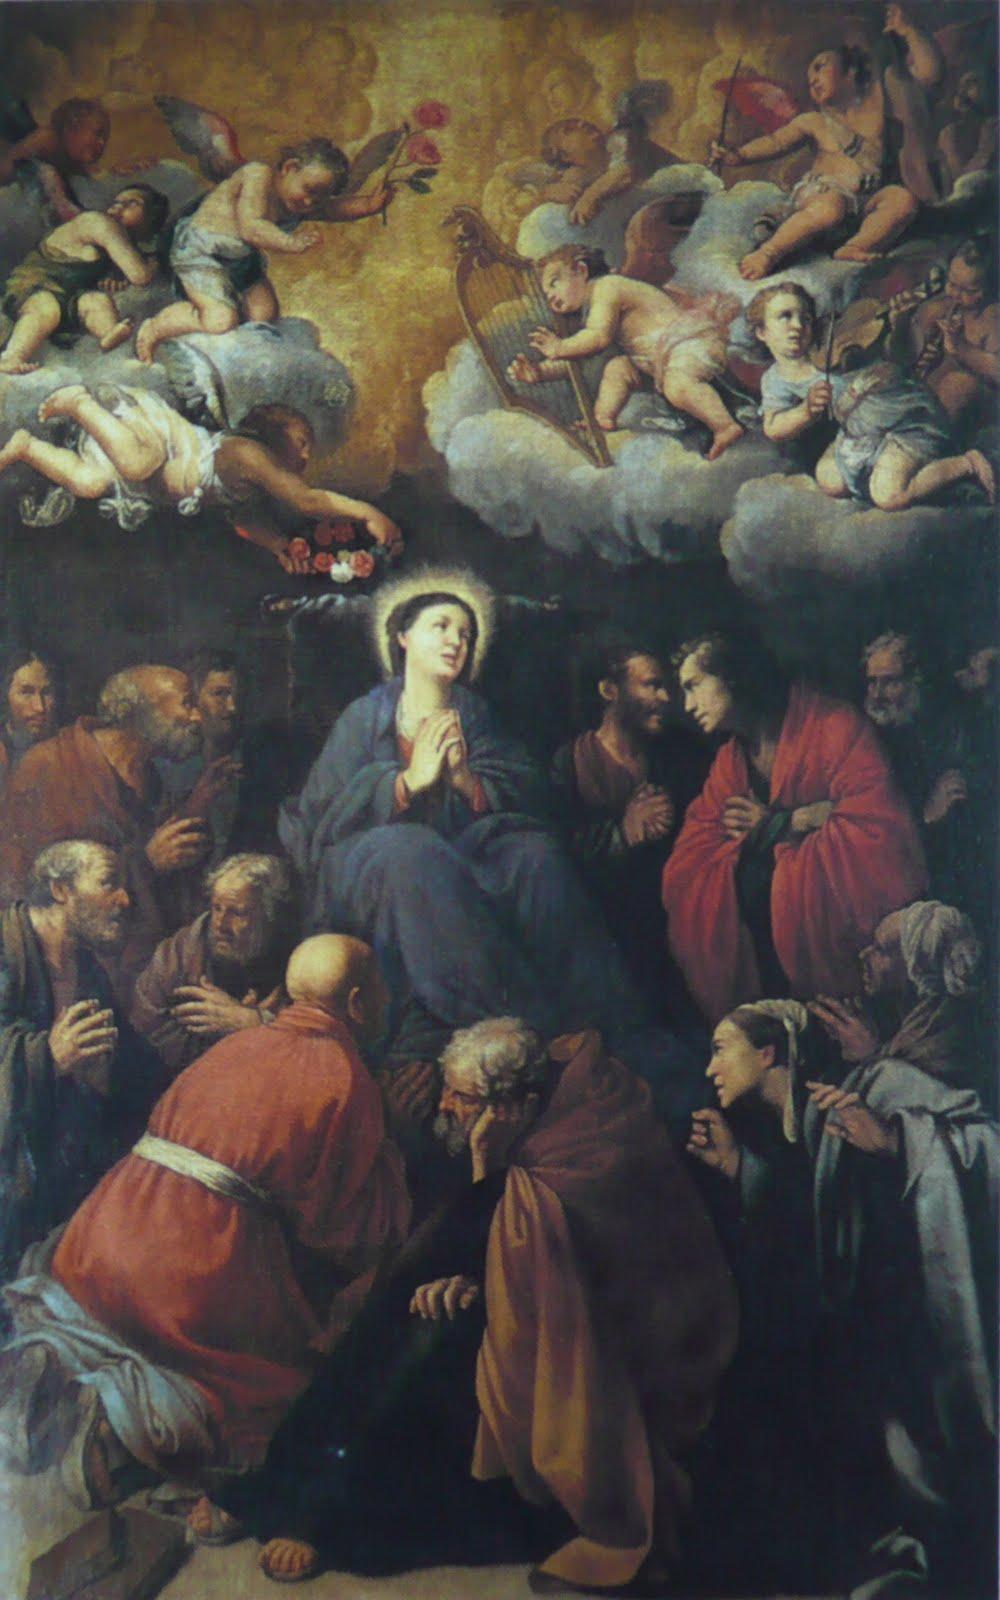 Death of the virgin caravaggio